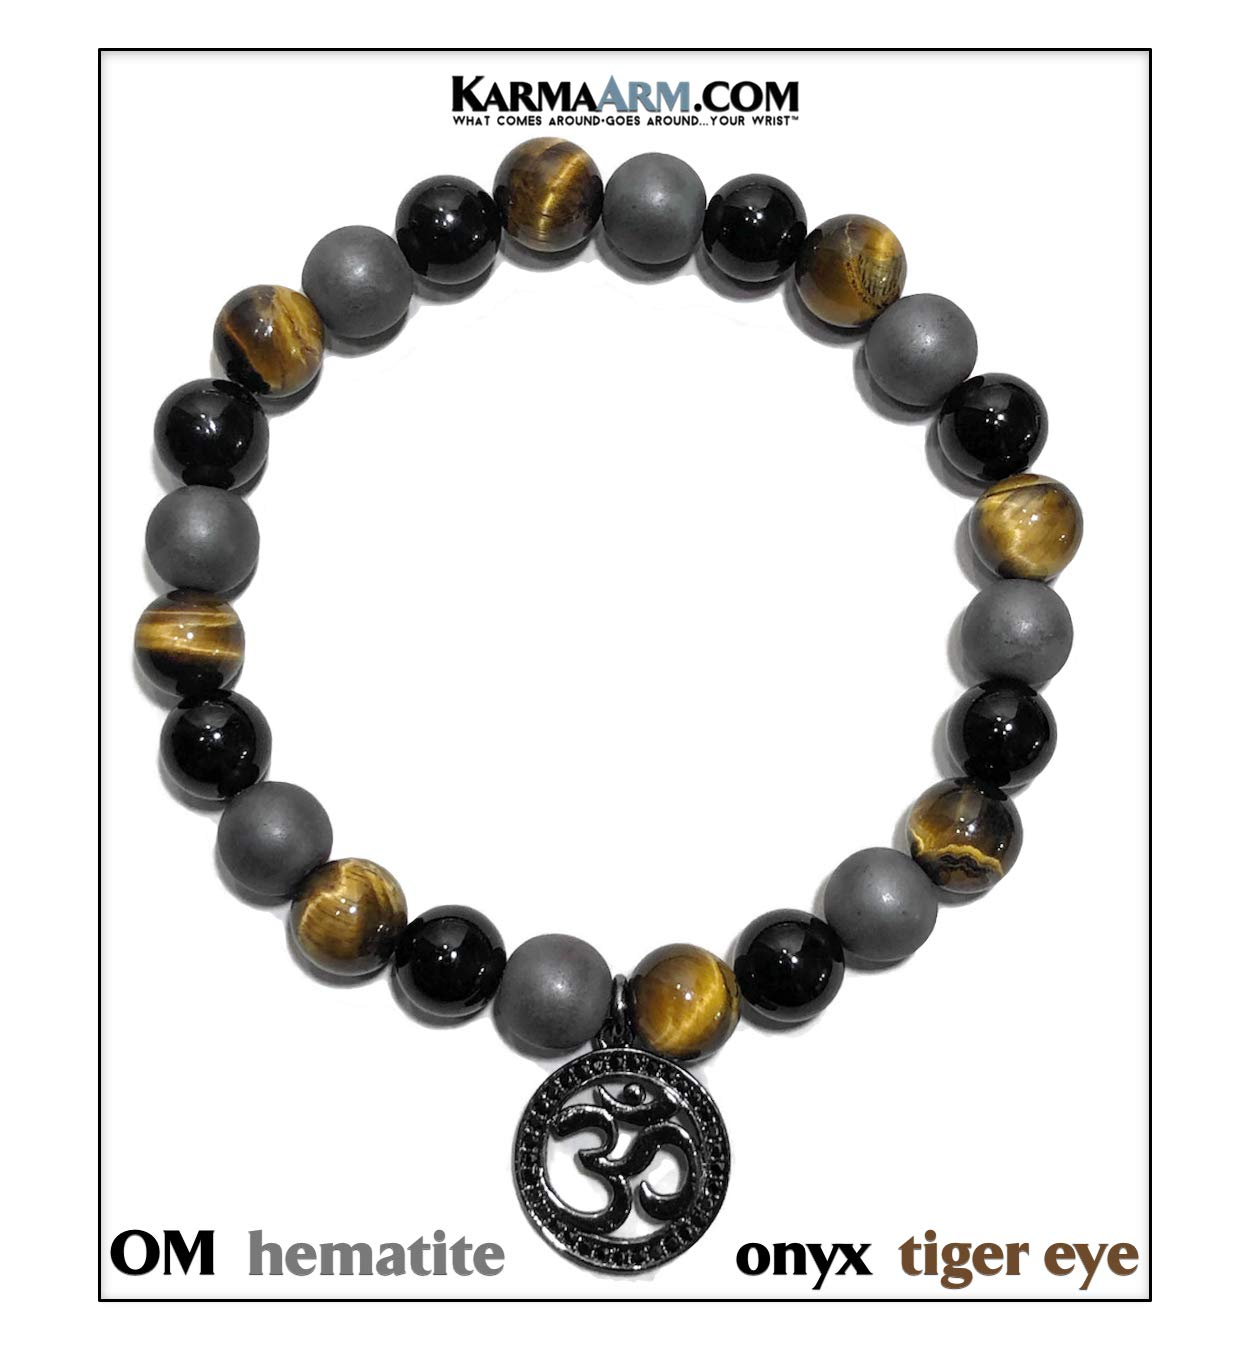 OM Buddhist Bracelet | Transformation | Mantra Meditation Wristband | Reiki Healing Energy Bead Zen Self-Care Charm Yoga Jewelry | Black Onyx | Hematite | Tiger Eye (6.5)